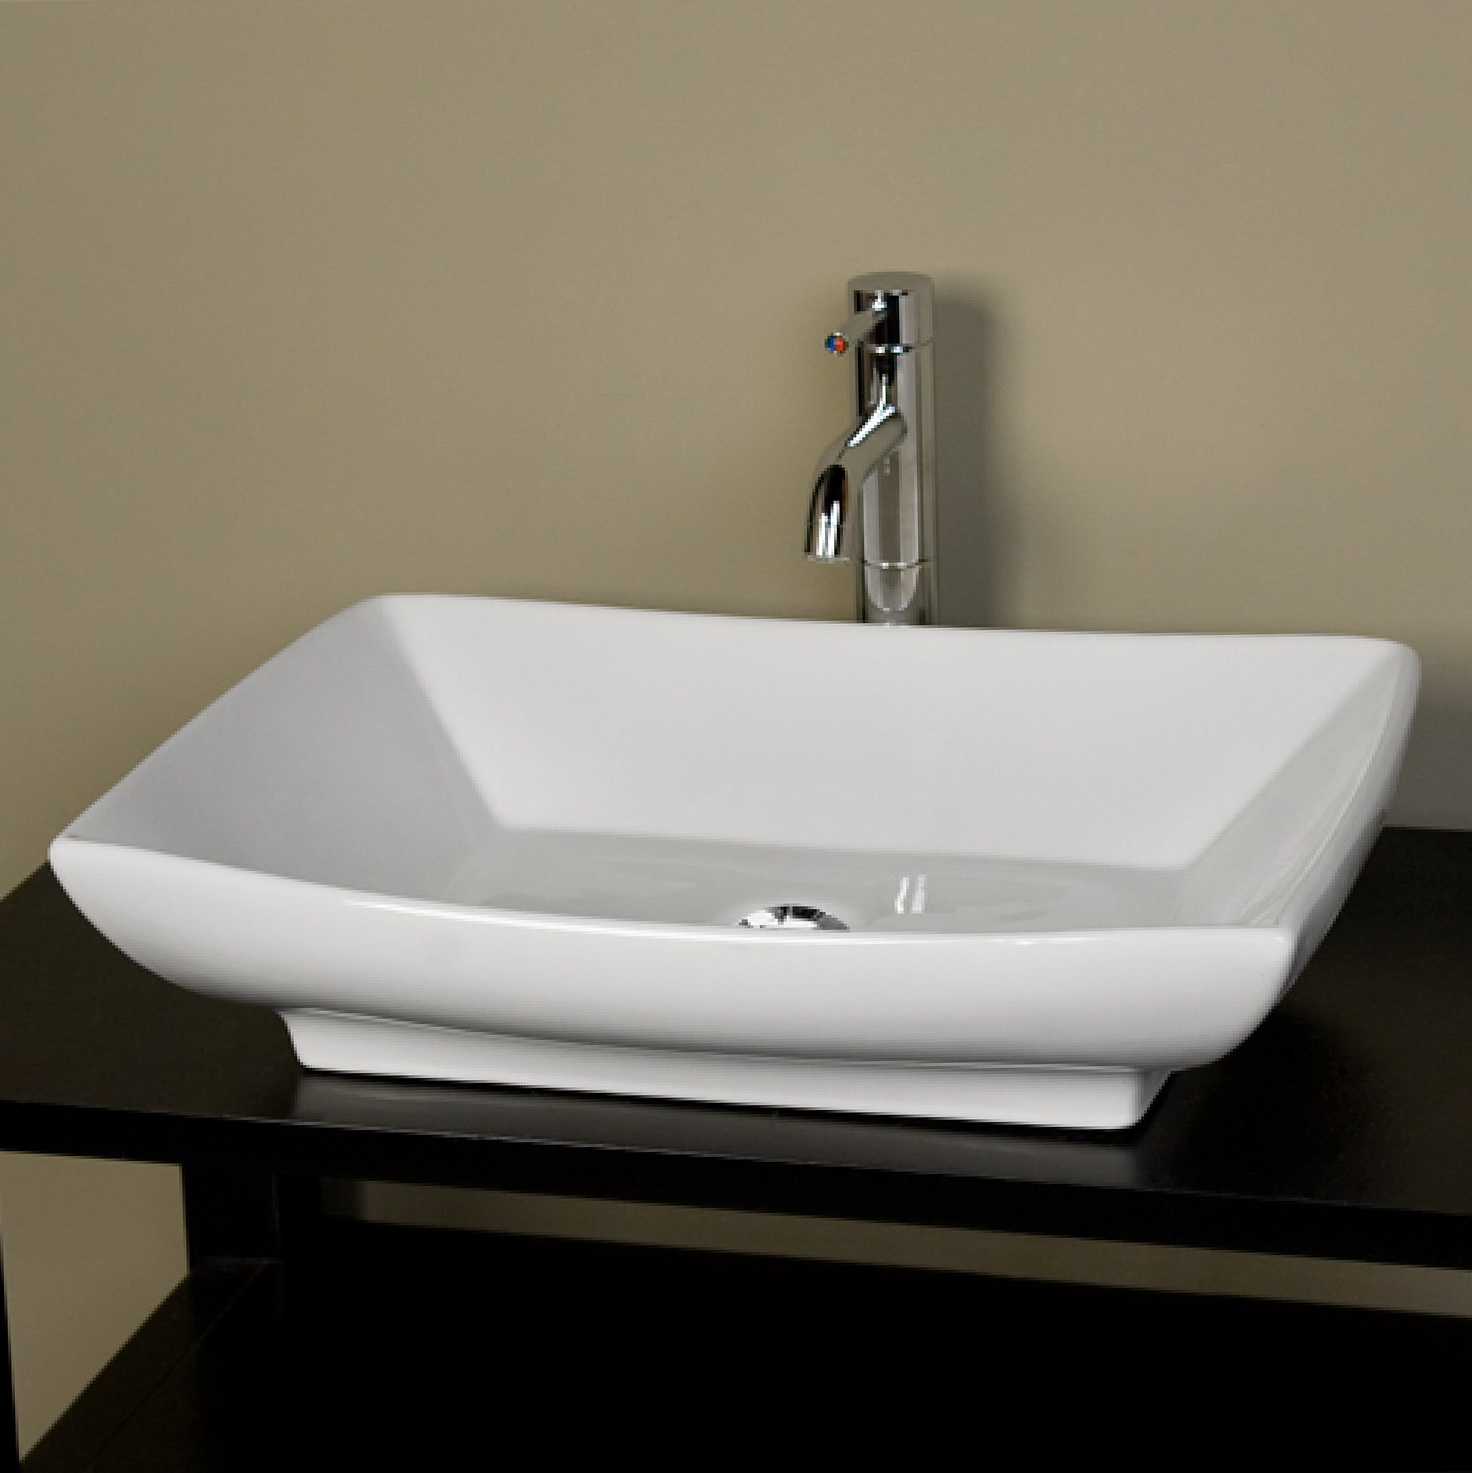 Bathroom Vanities With Square Sinks